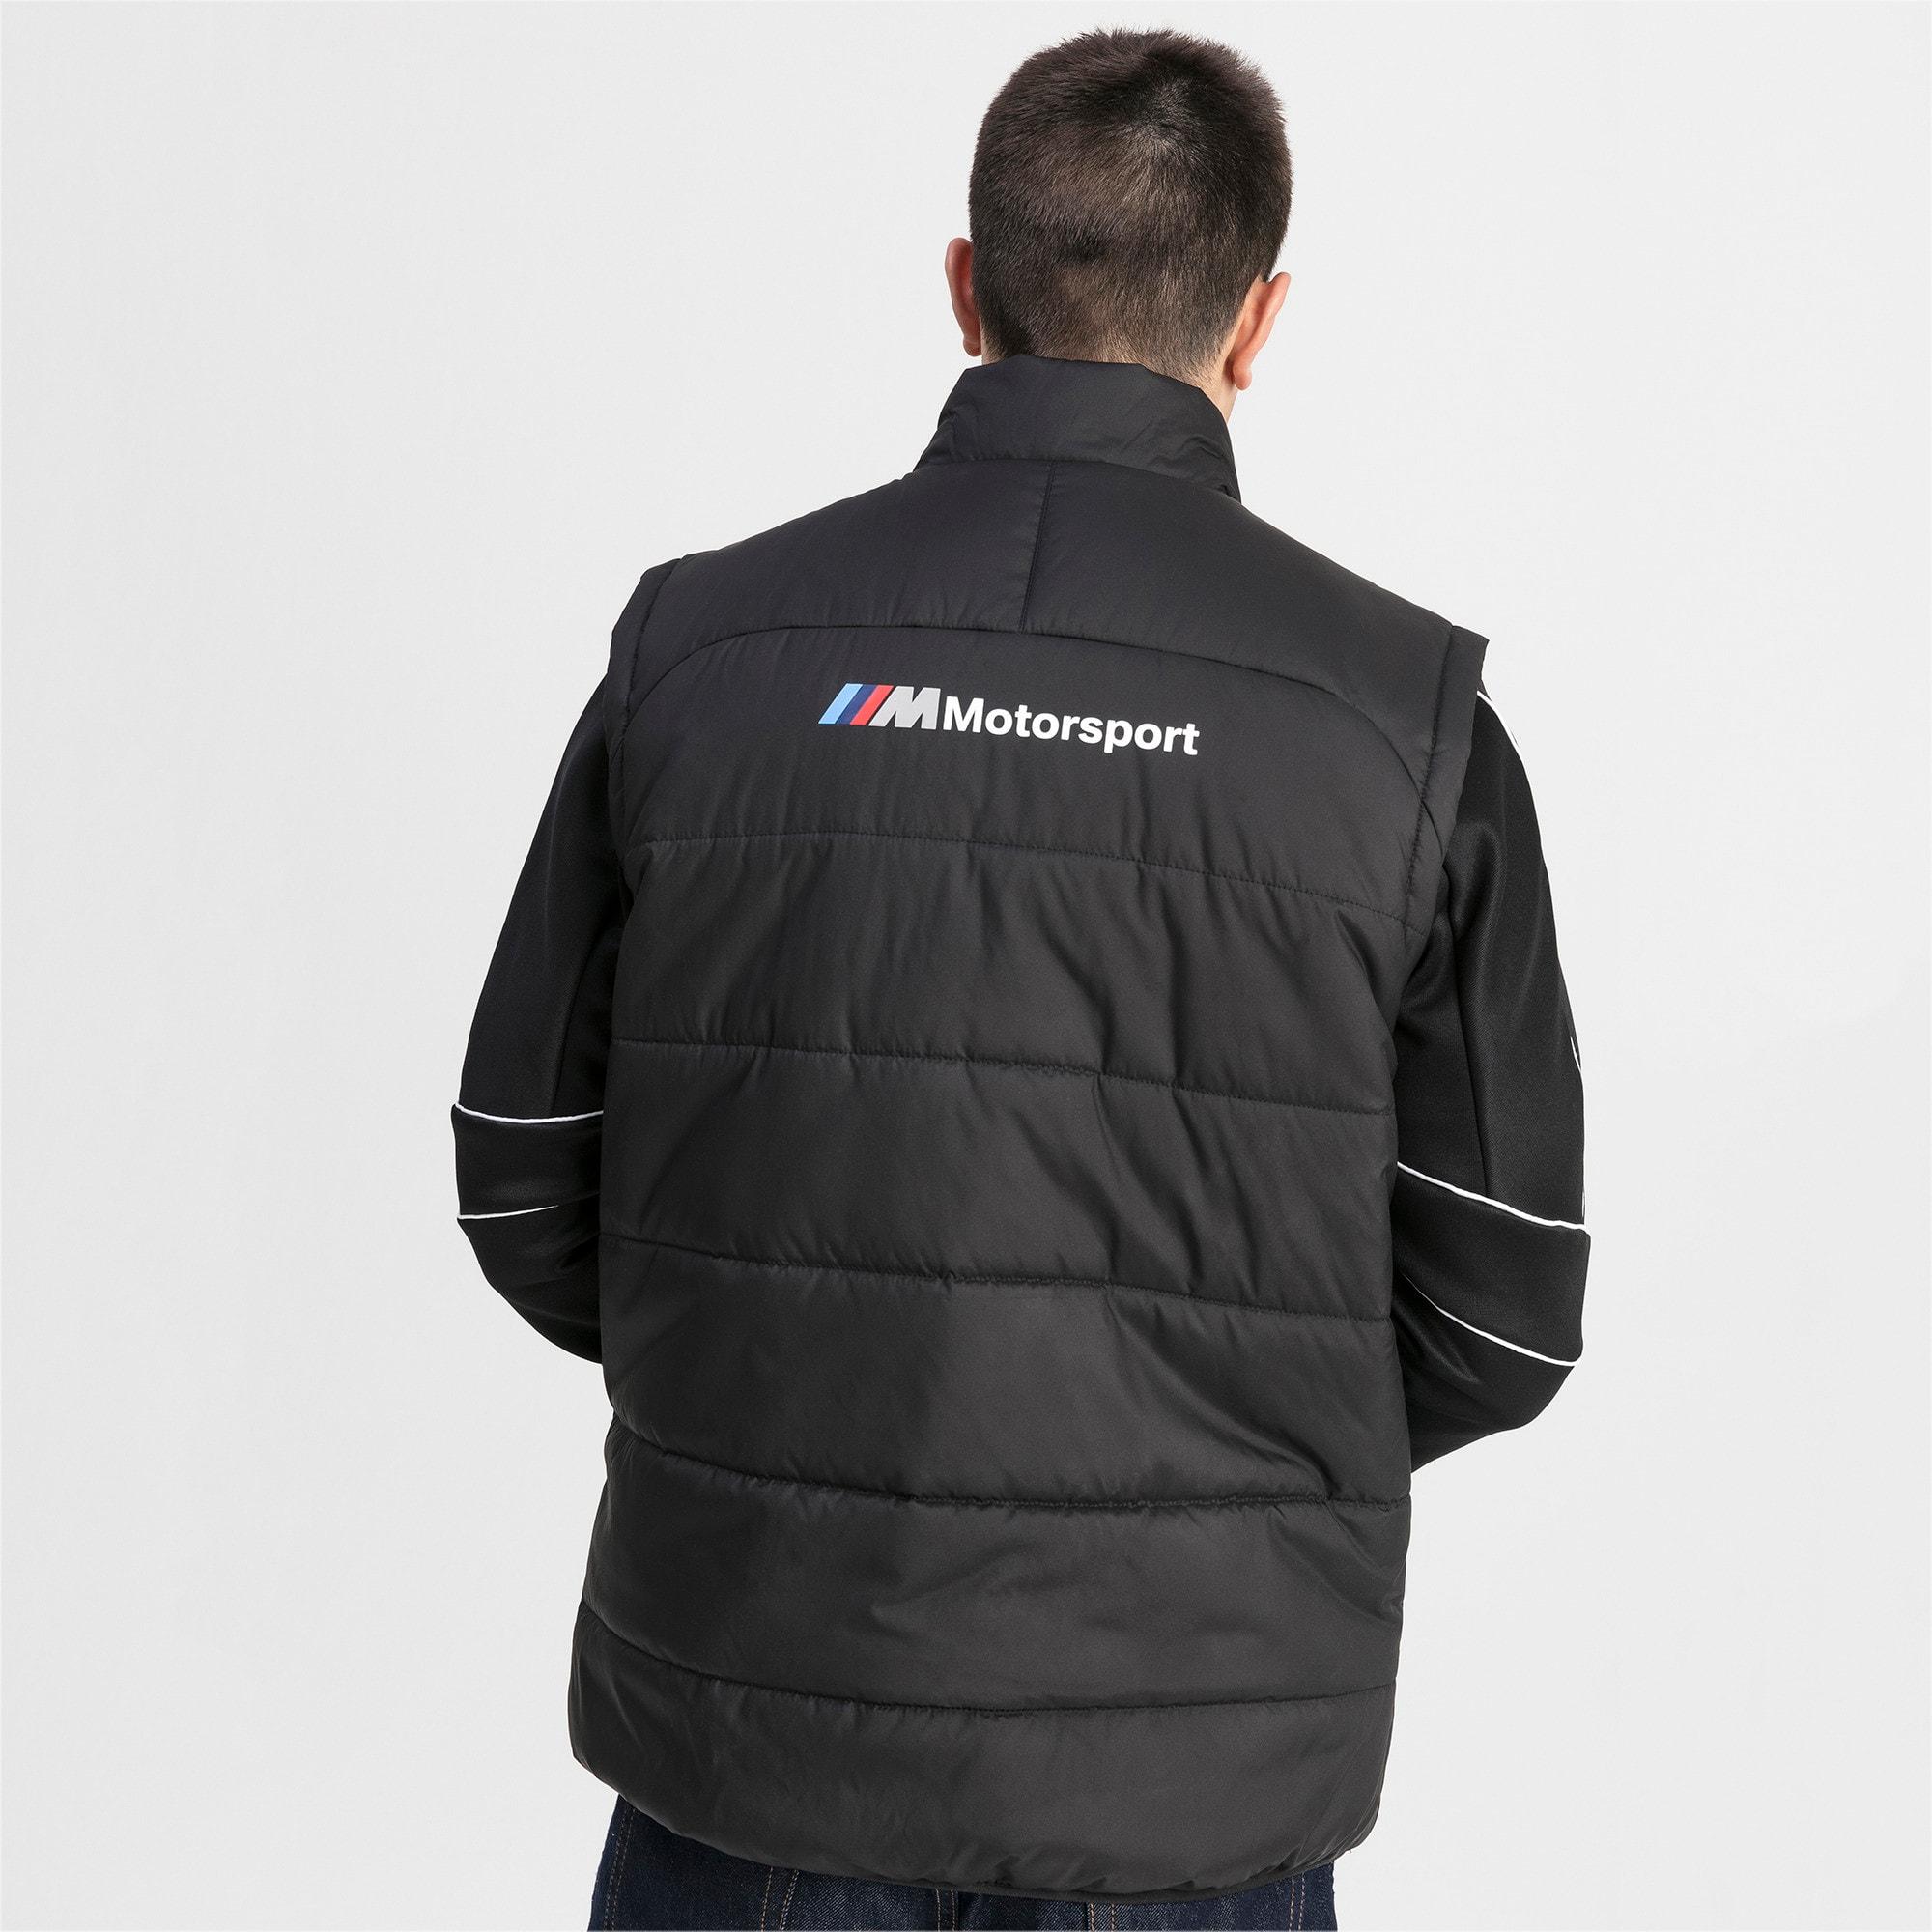 Thumbnail 2 of BMW M Motorsports Men's Padded Vest, Puma Black, medium